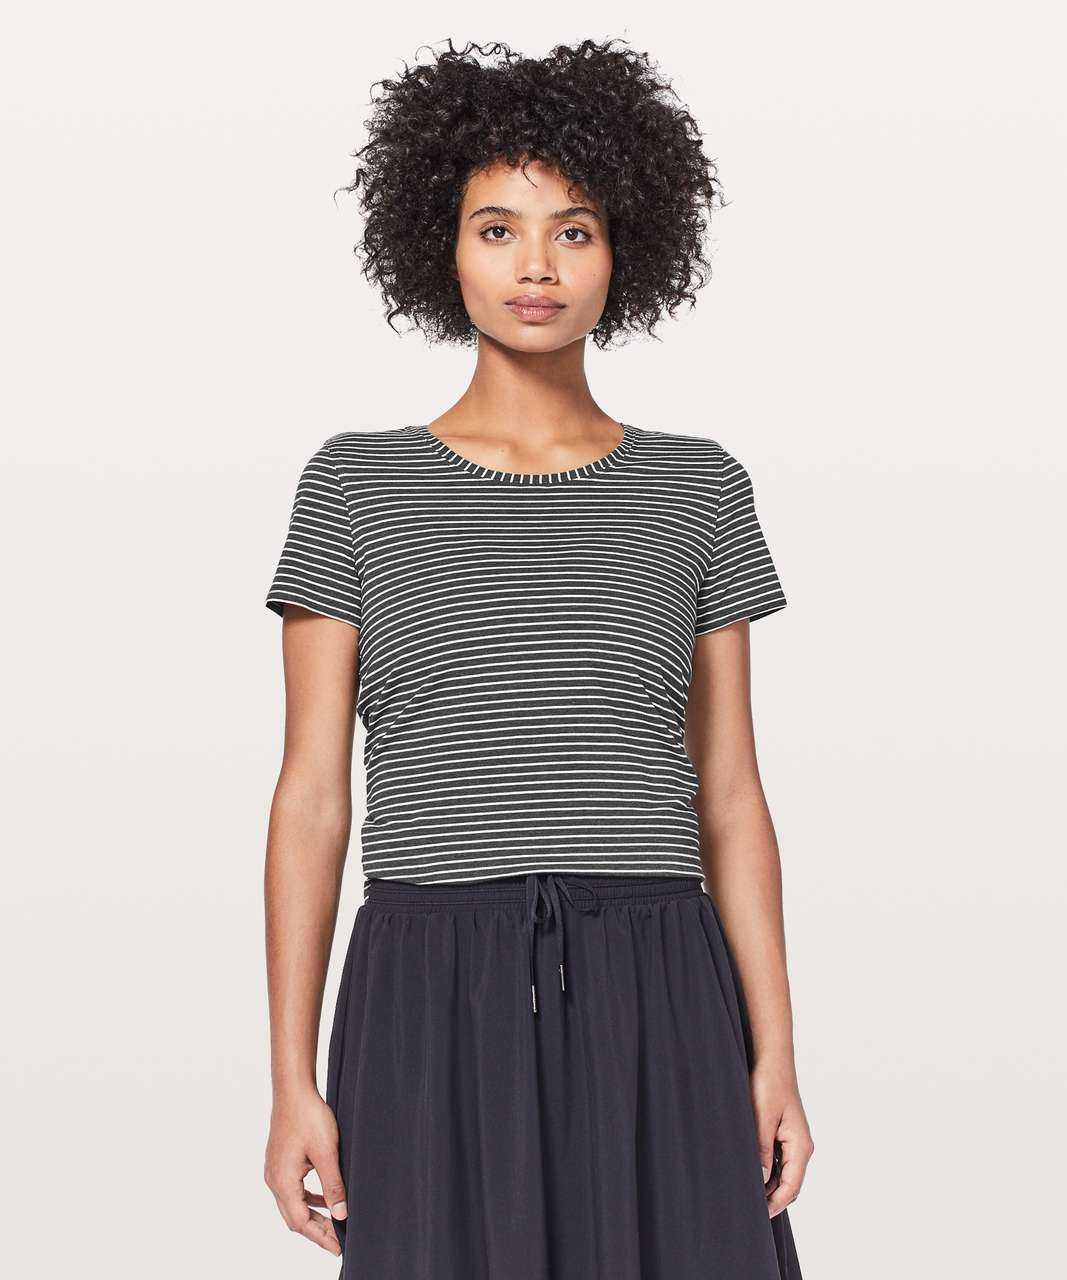 Lululemon Love Crew III - Modern Stripe Heathered Black White